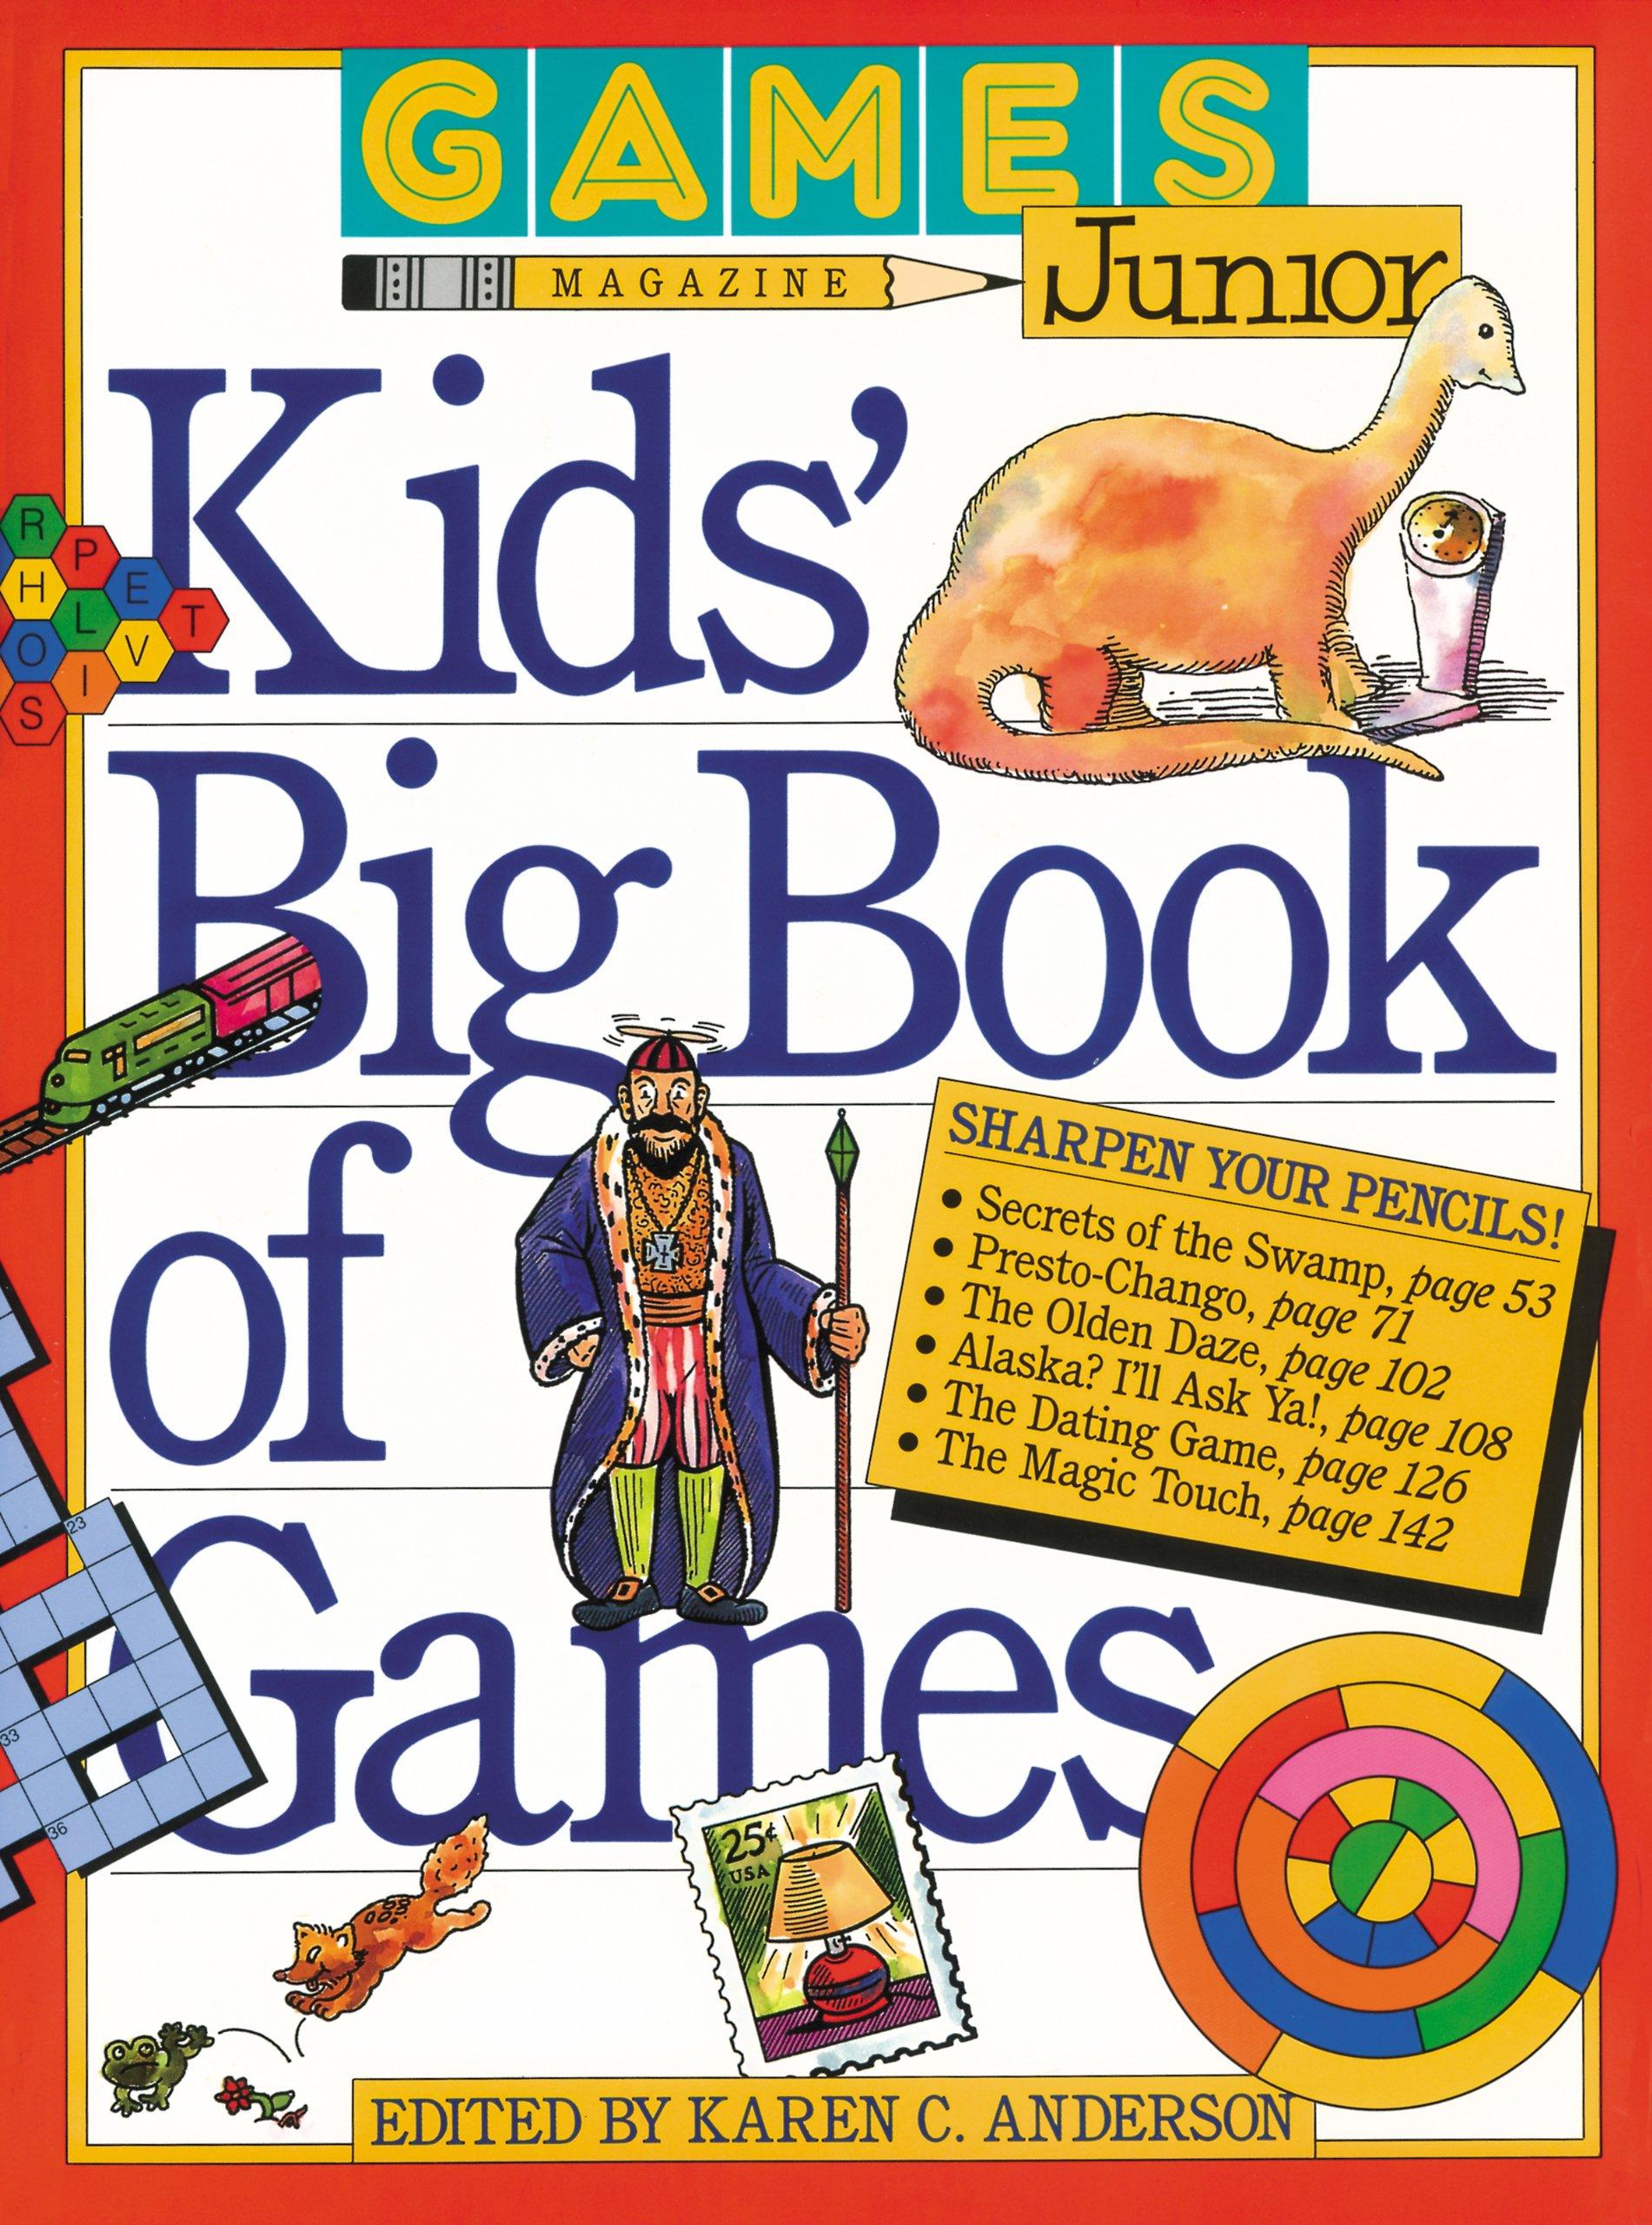 Games Magazine Junior Kids Big Book Of Games Karen C